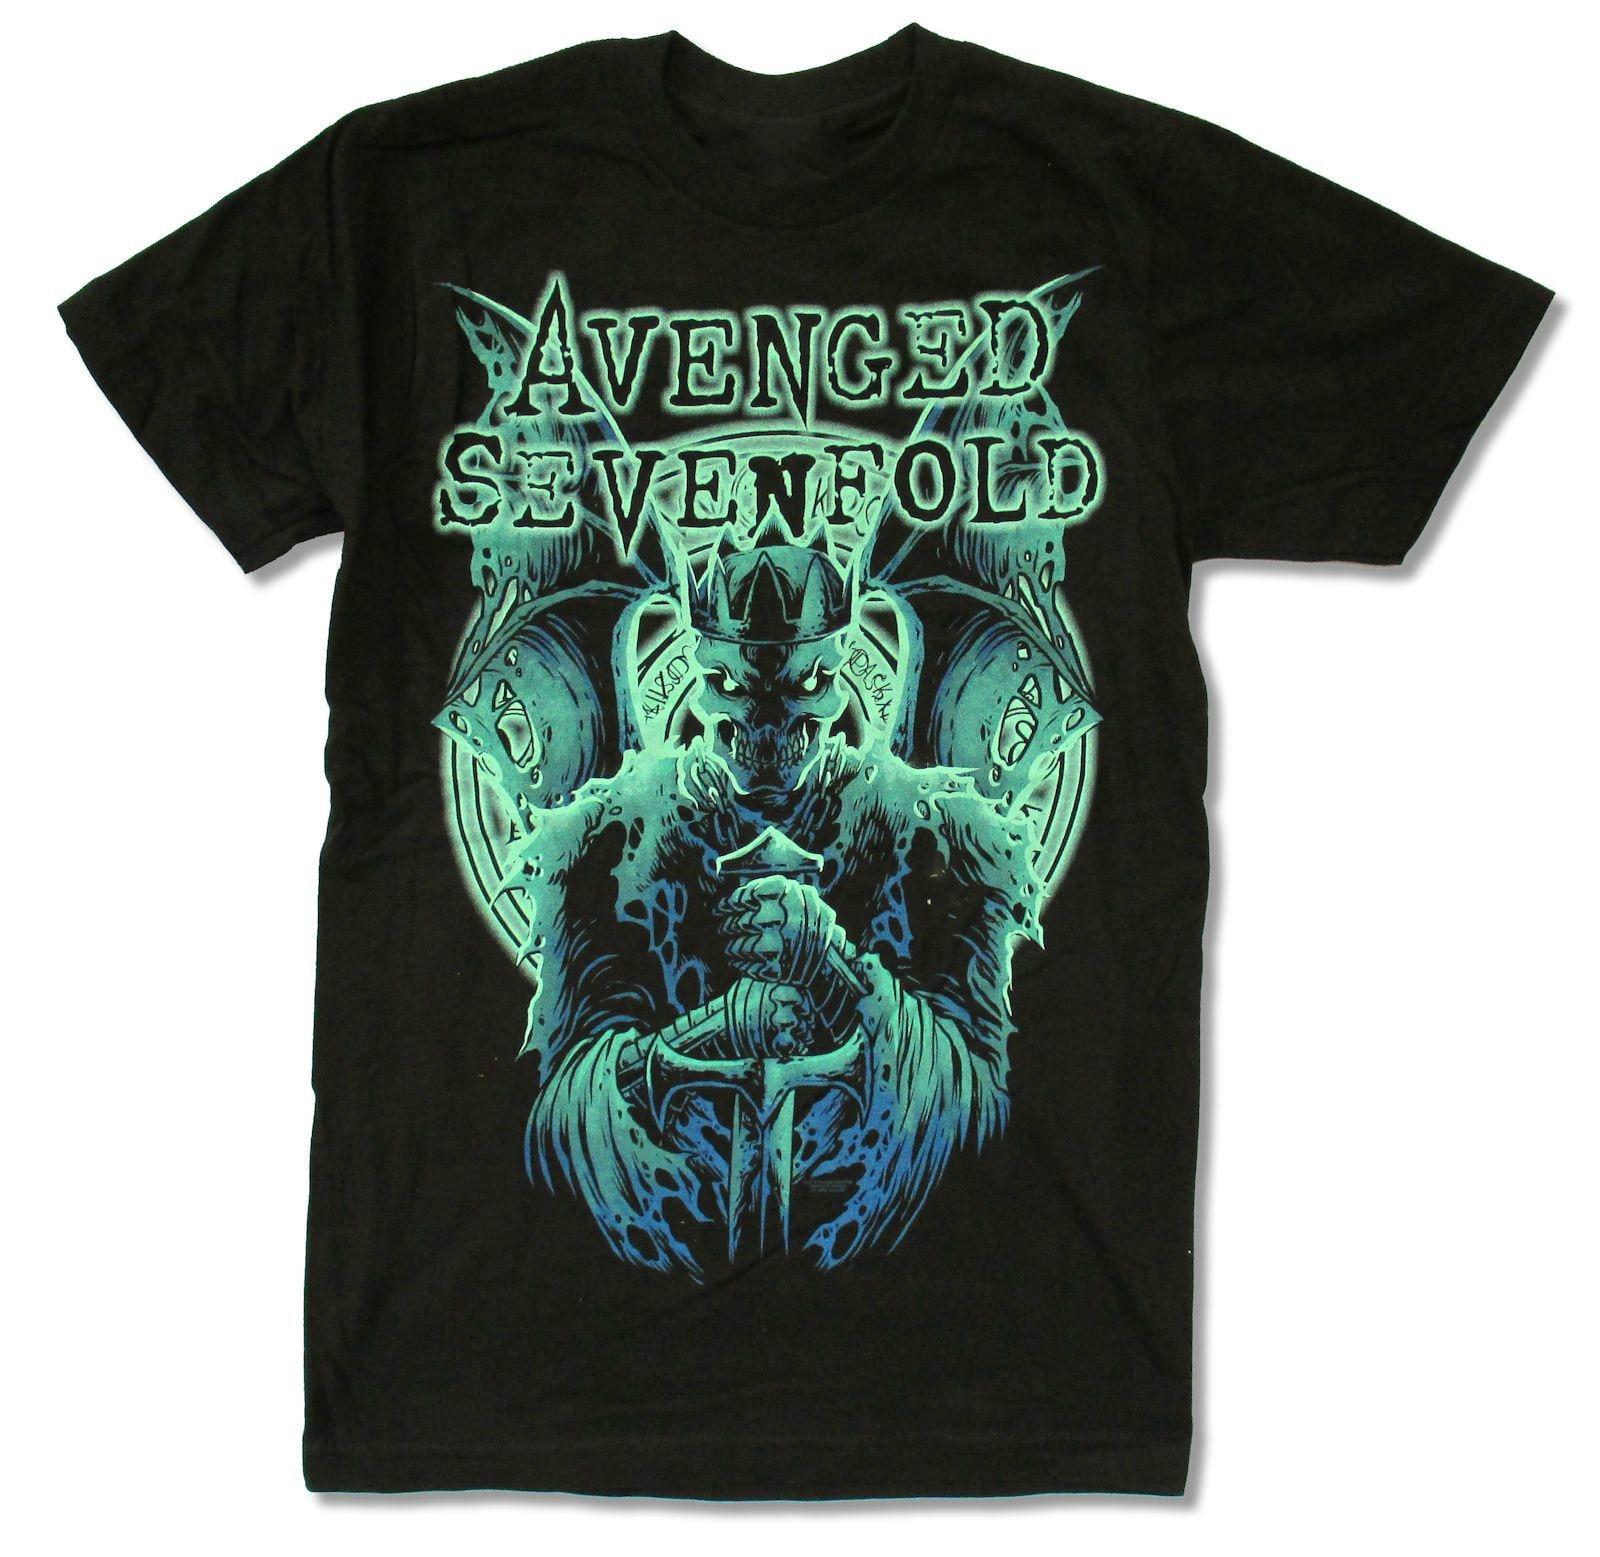 Plain black t shirt quality - Plain Black T Shirt Quality Avenged Sevenfold Knight Black Slim Fit T Shirt New Official Download